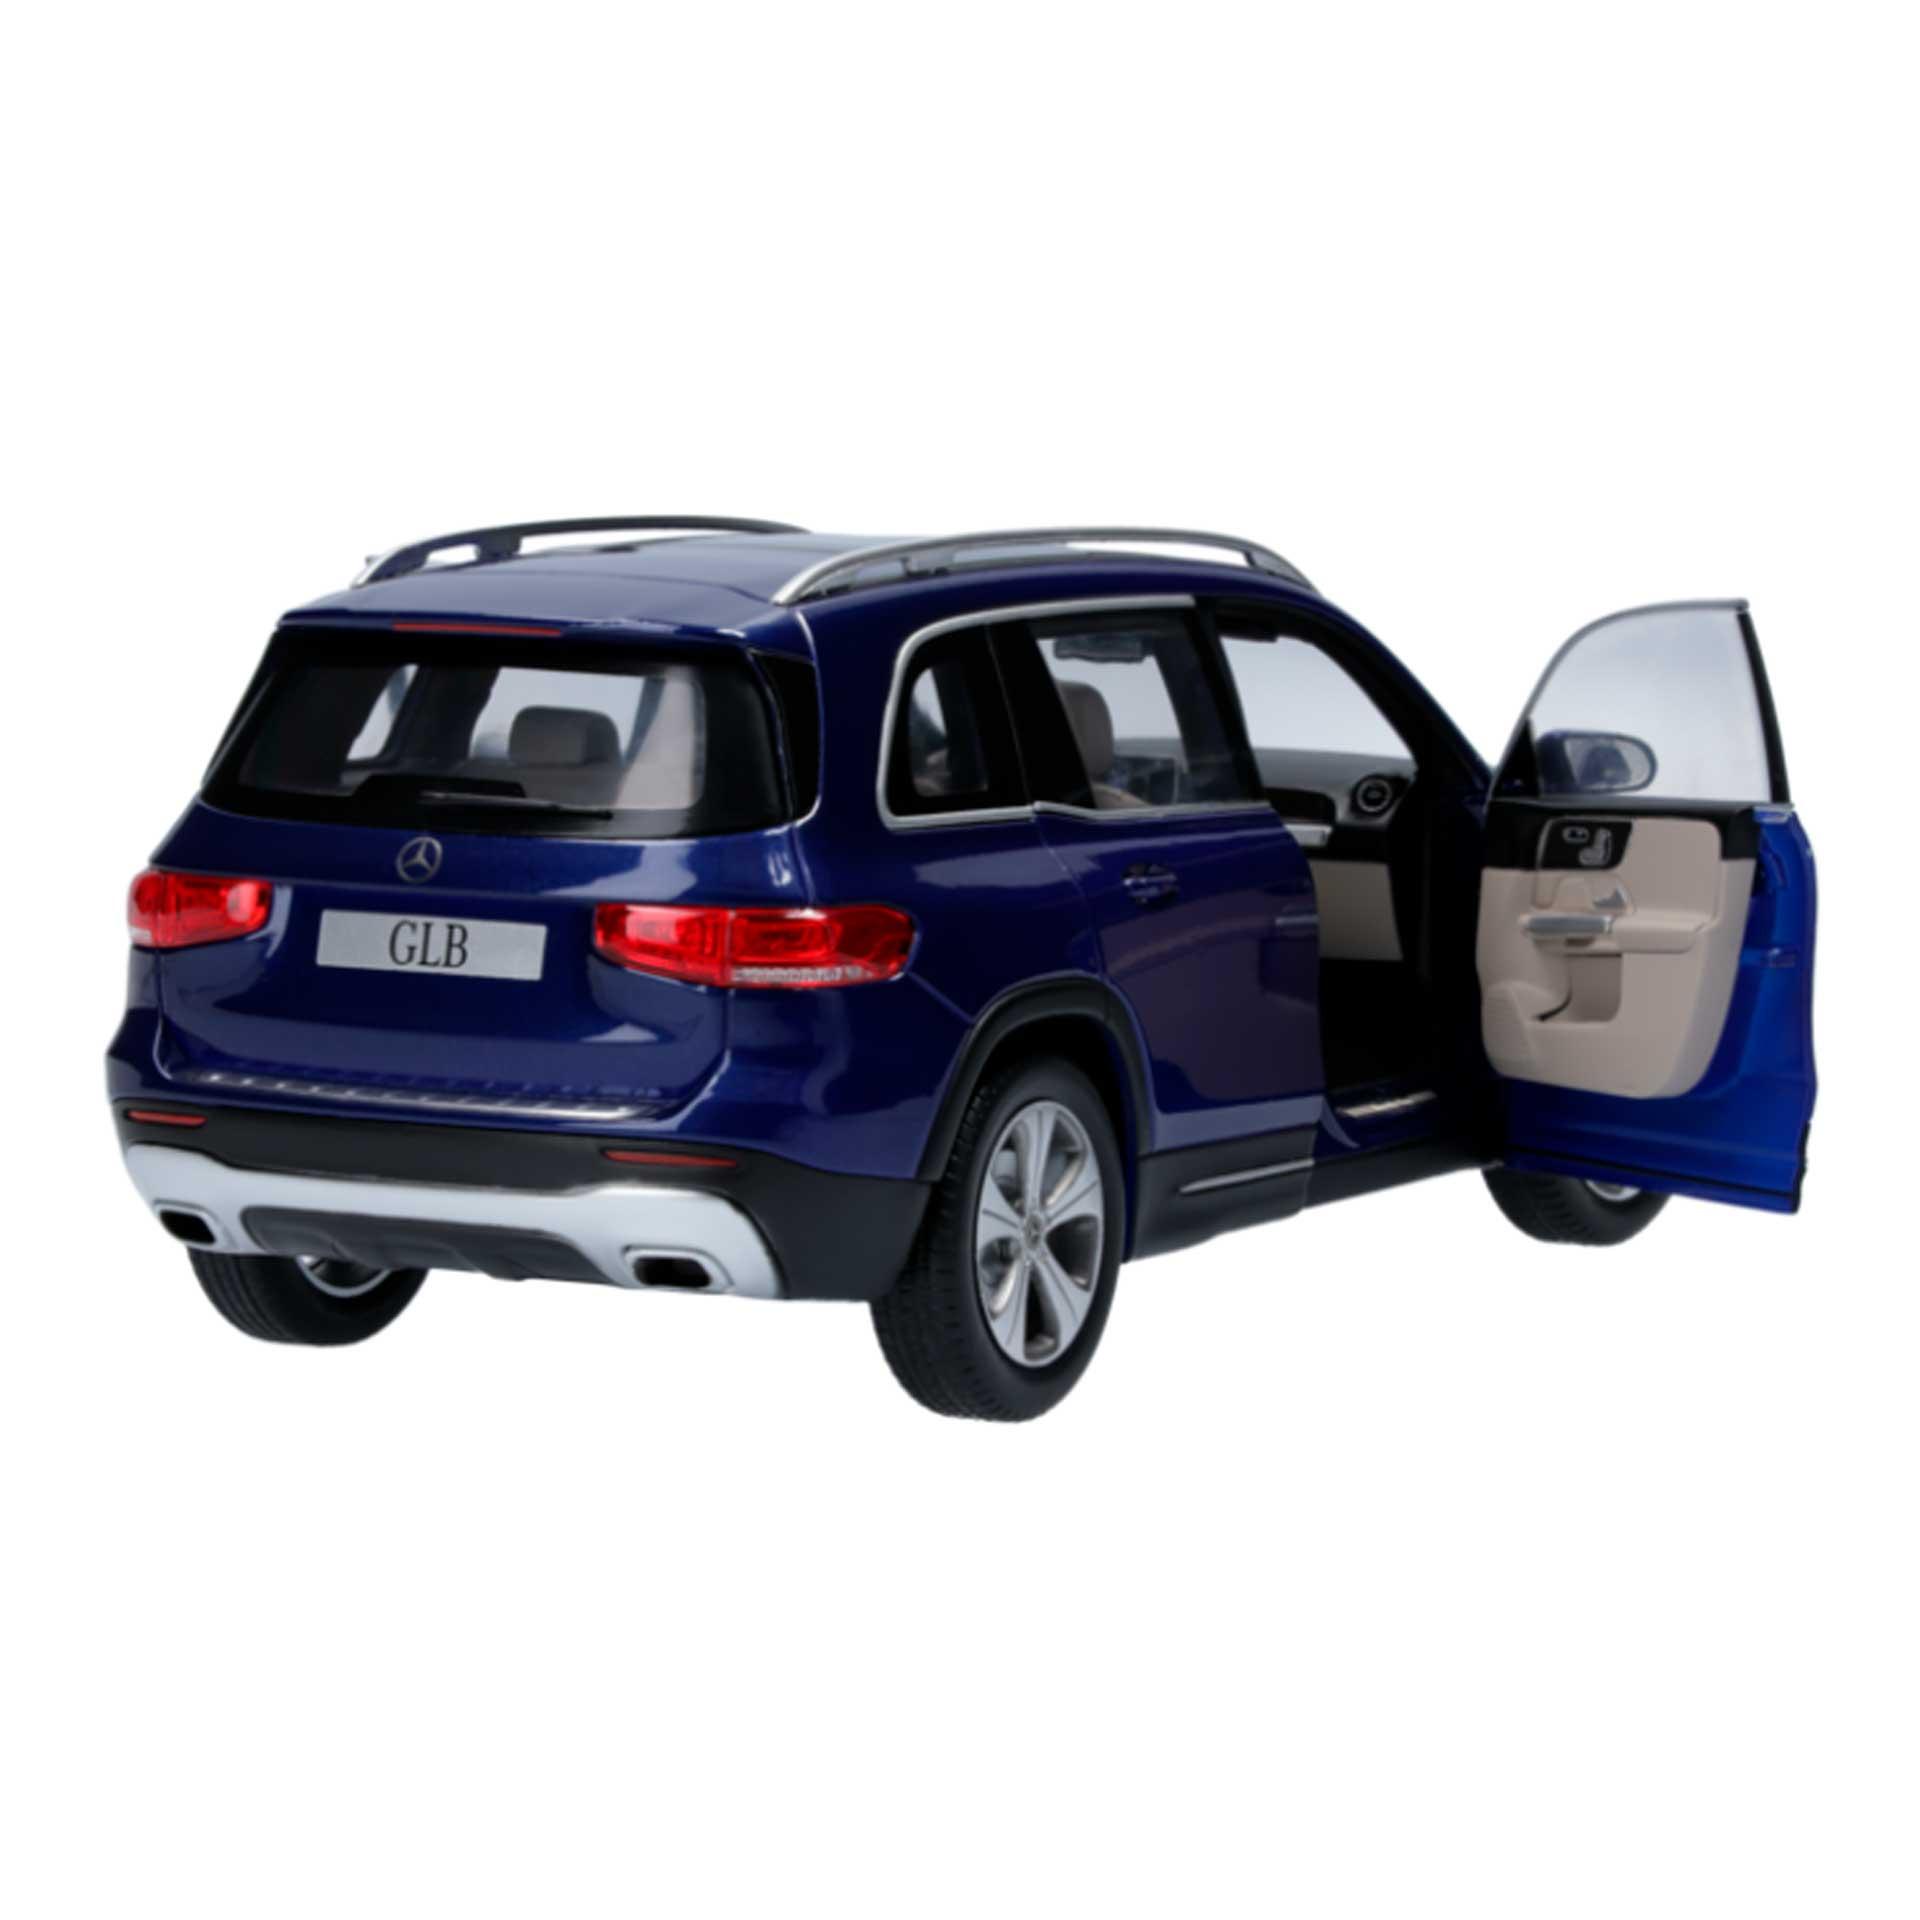 Mercedes-Benz GLB Modellauto 1:18 blau